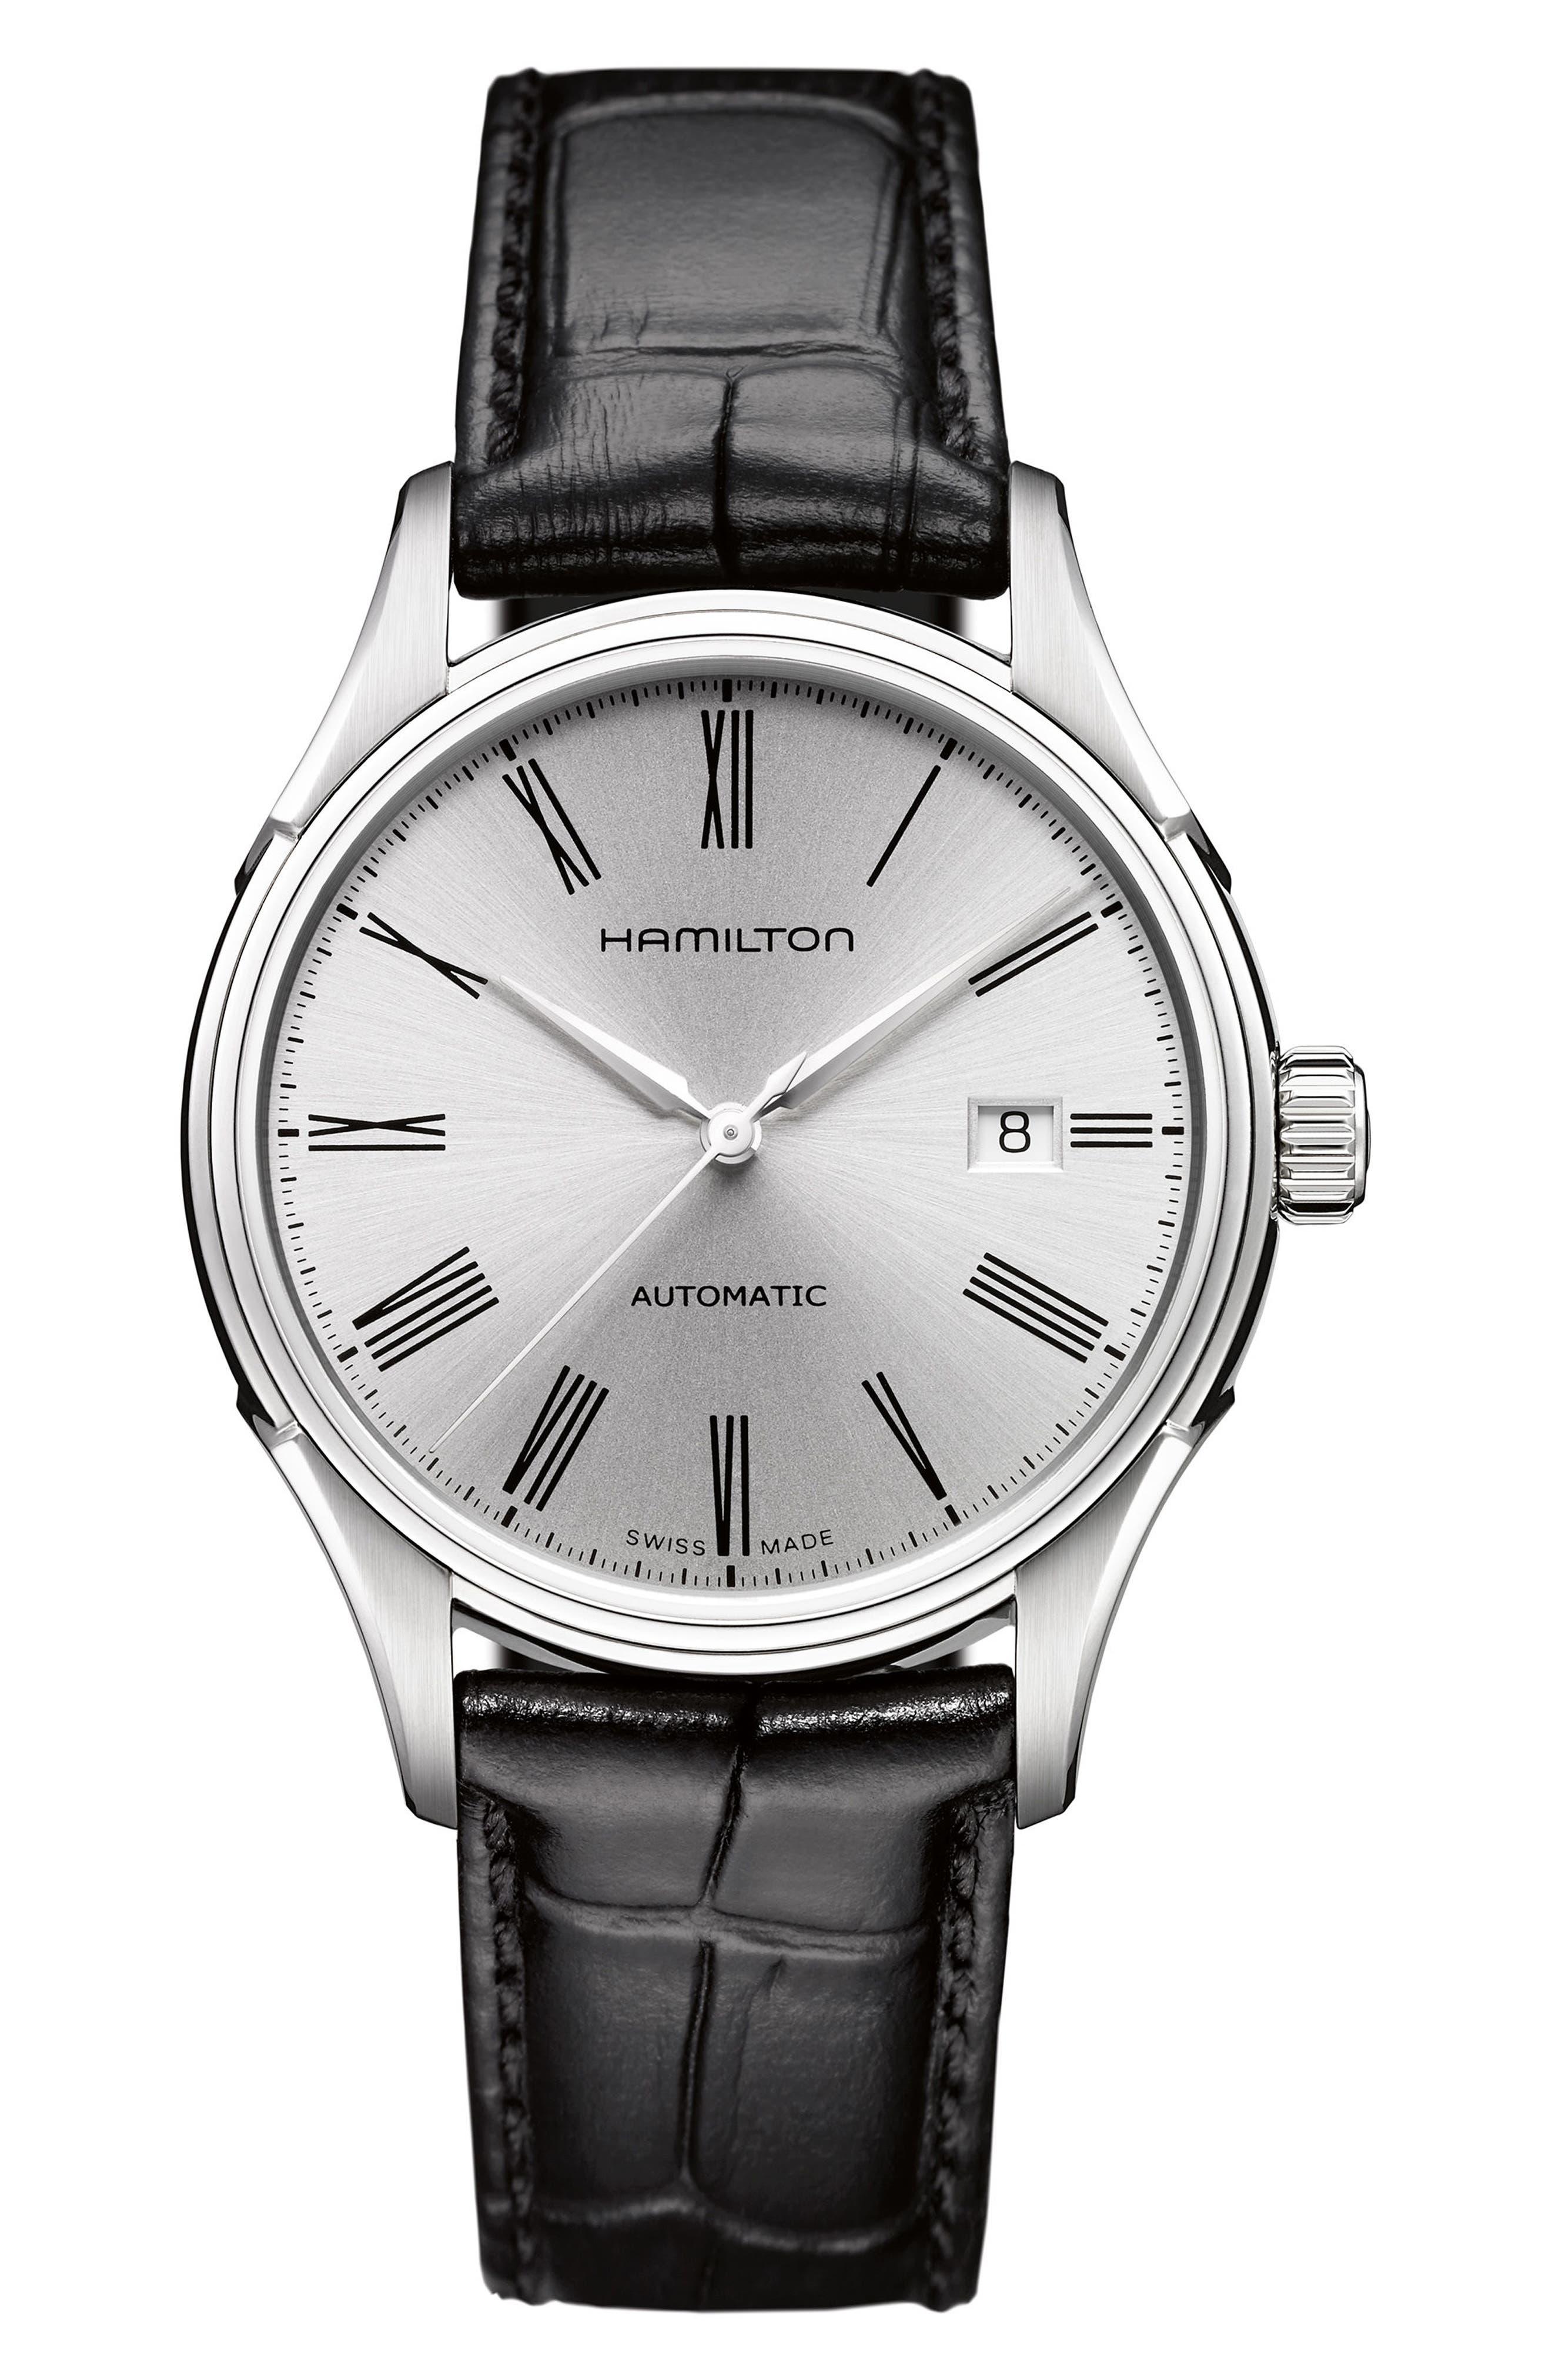 Main Image - Hamilton Valiant Automatic Leather Strap Watch, 40mm